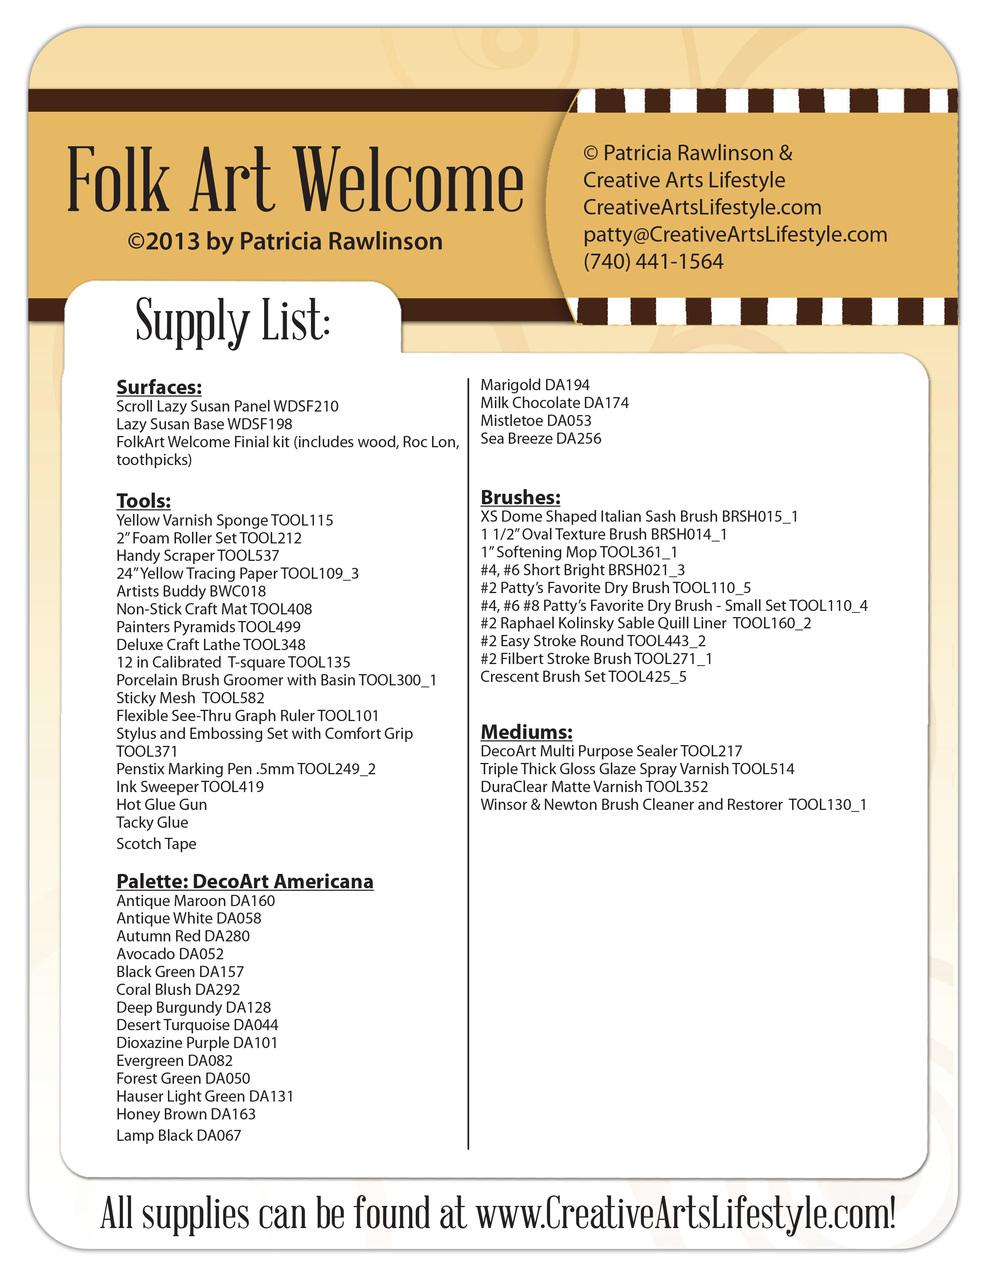 FolkArt Welcome - E-Packet - Patricia Rawlinson